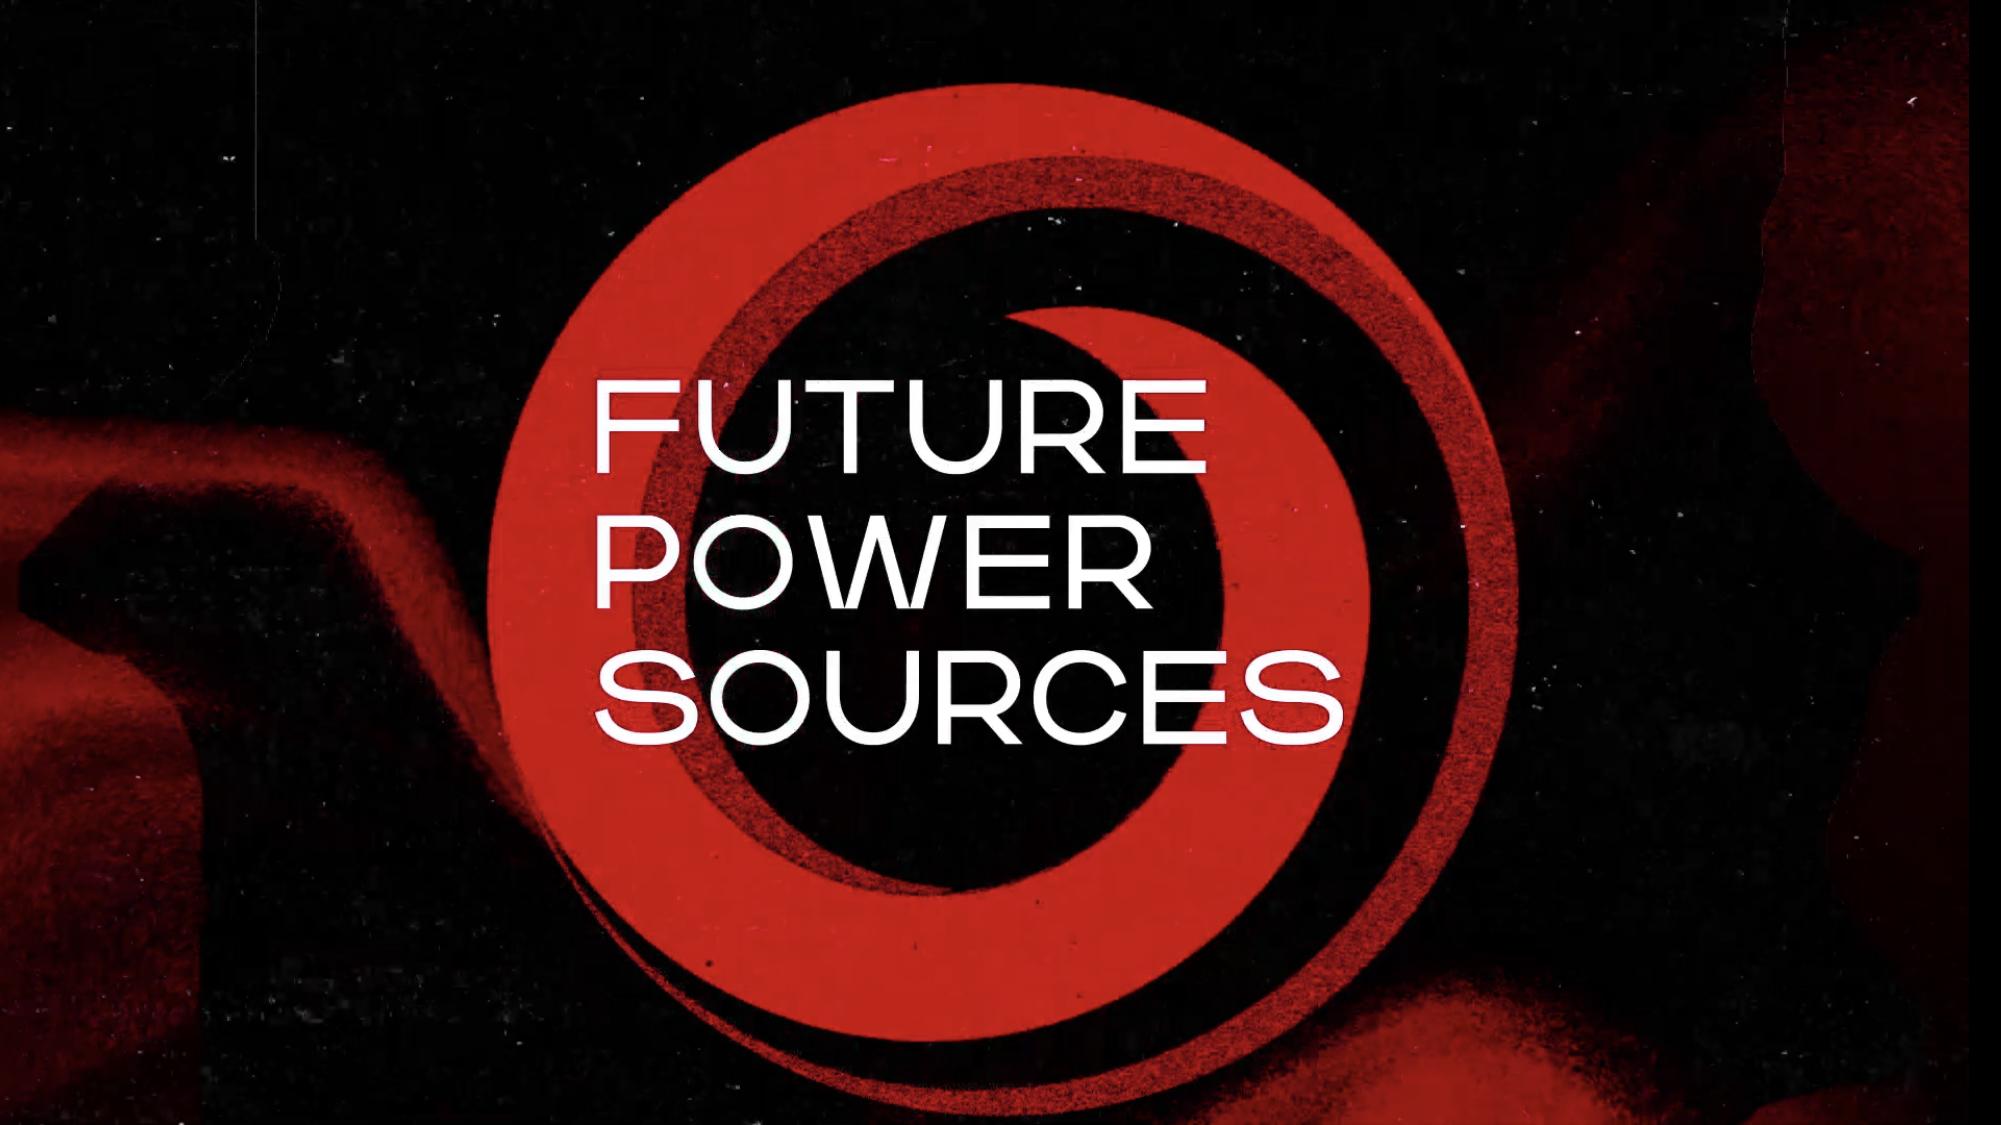 Marlowe (L'Orange & Solemn Brigham) - Future Power Sources | Official Video